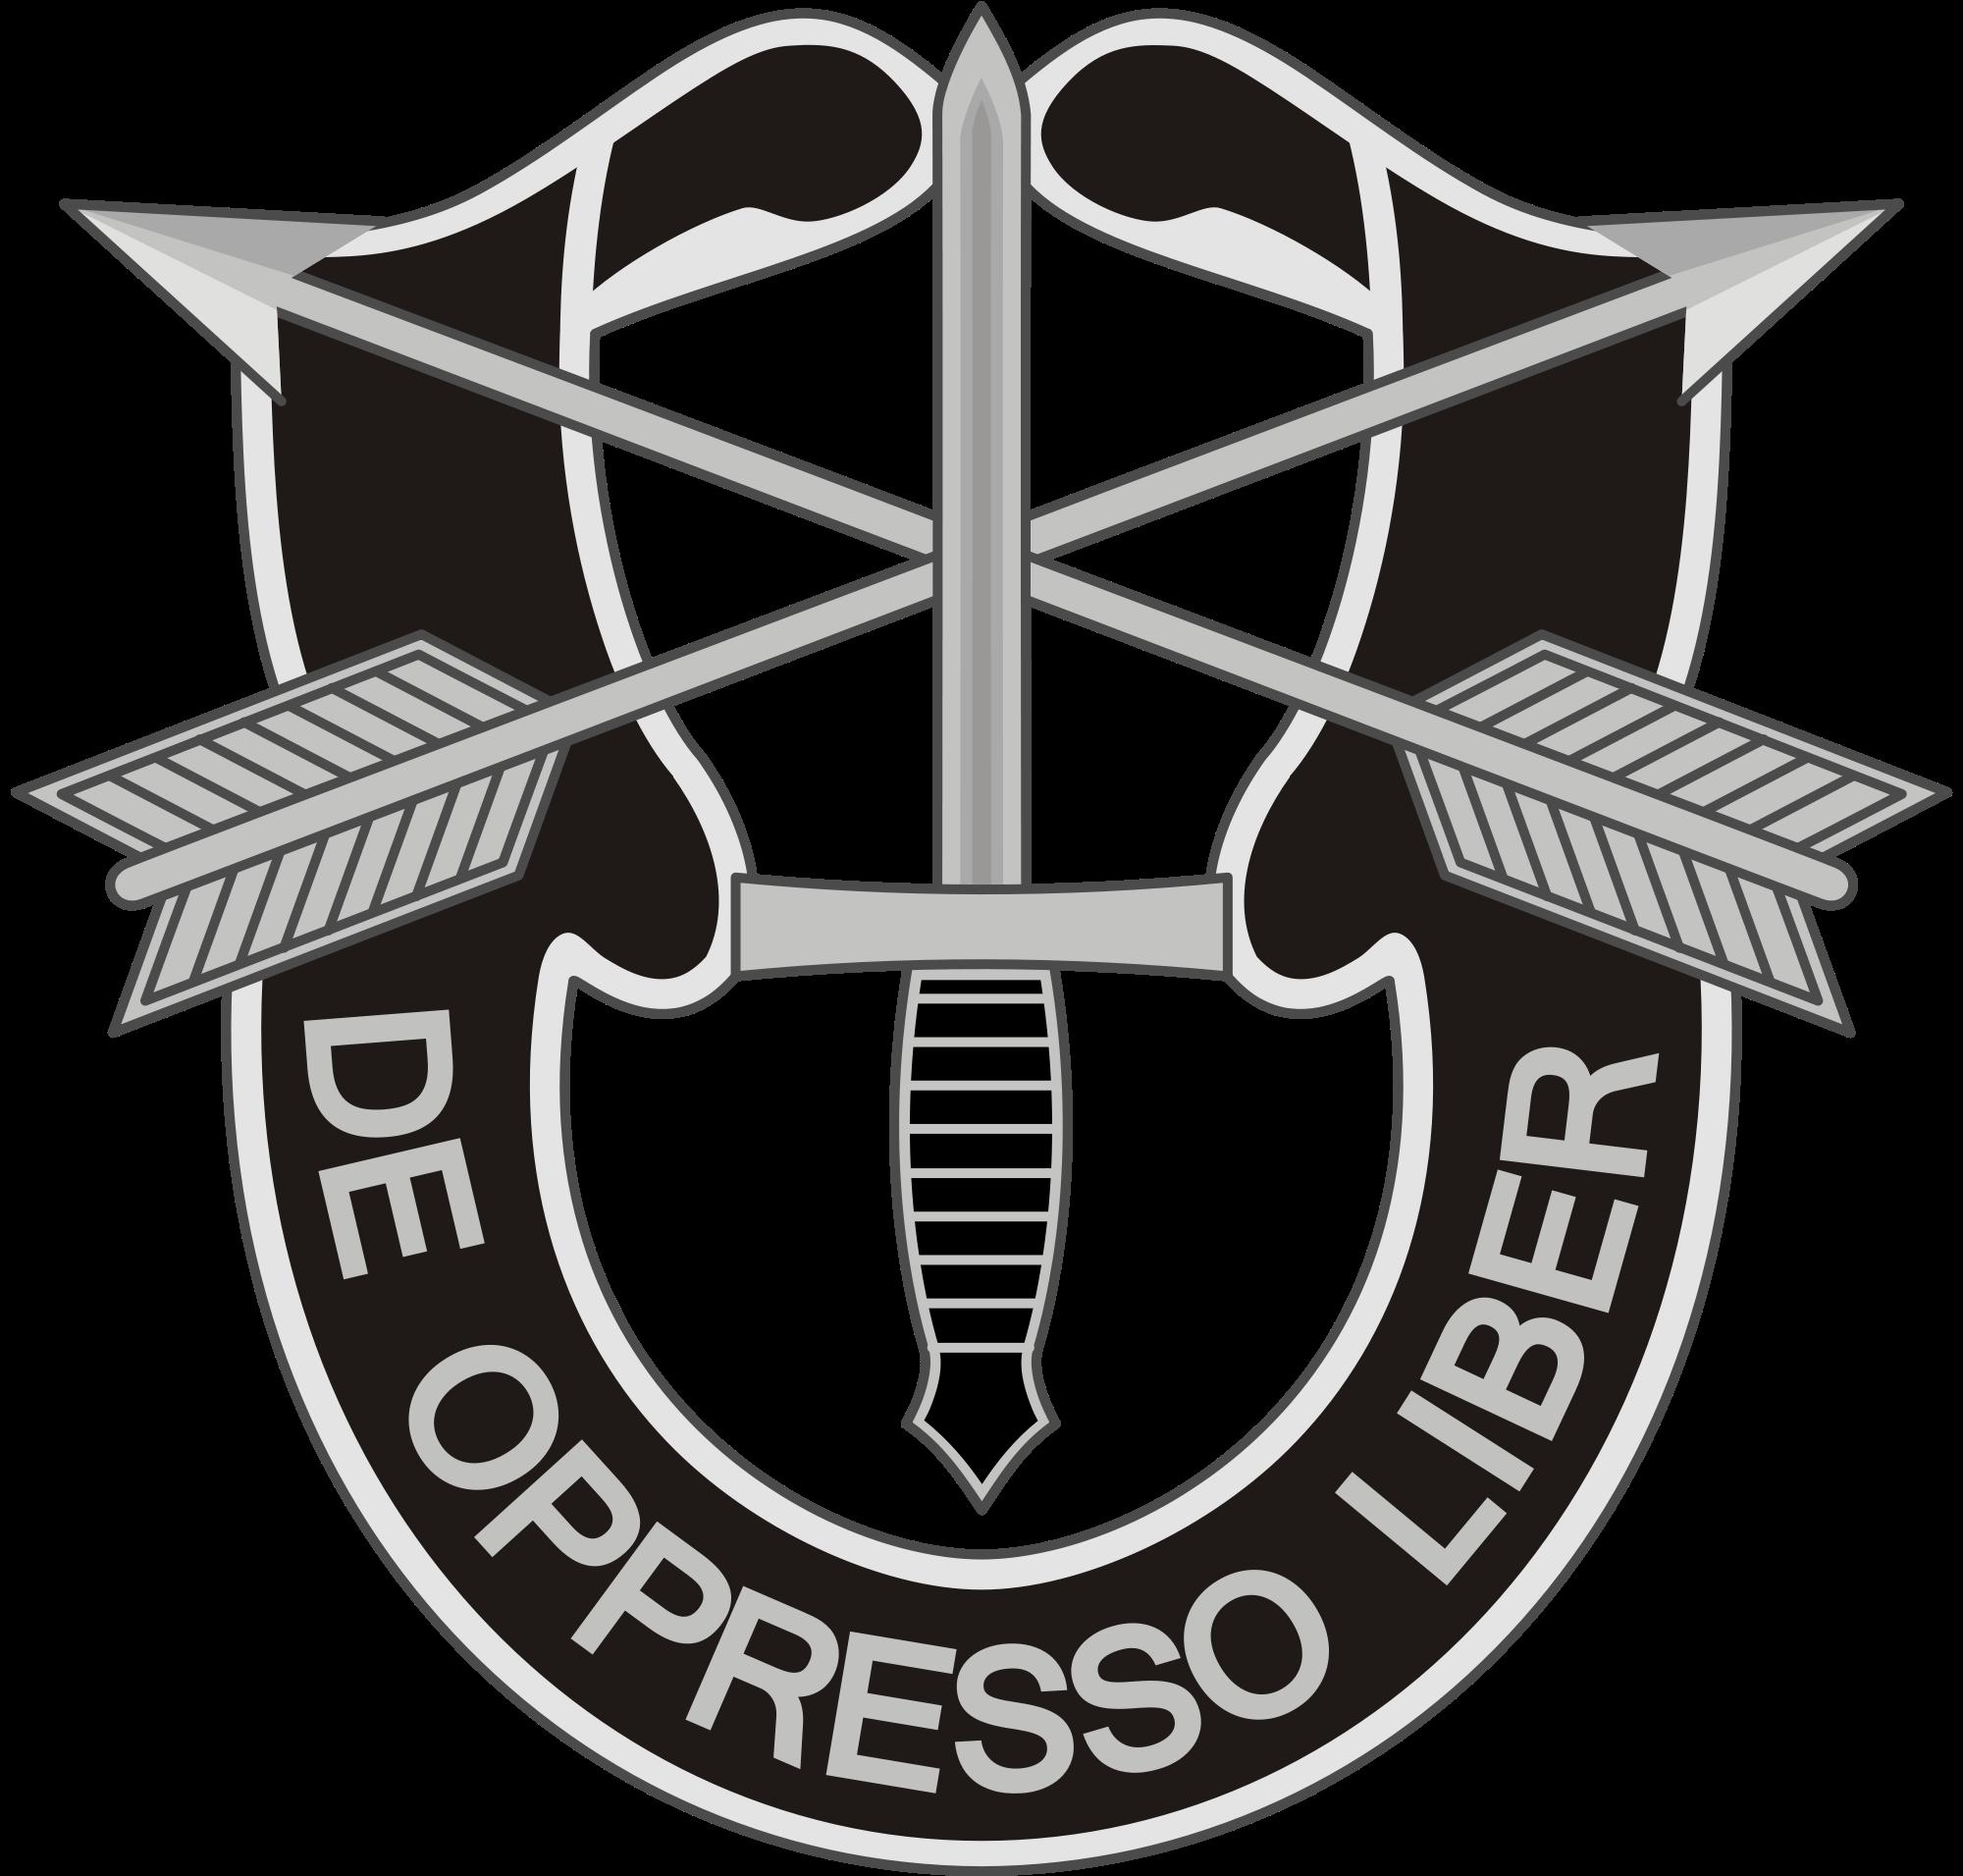 De Oppresso Liber tattoo Google Search Special forces